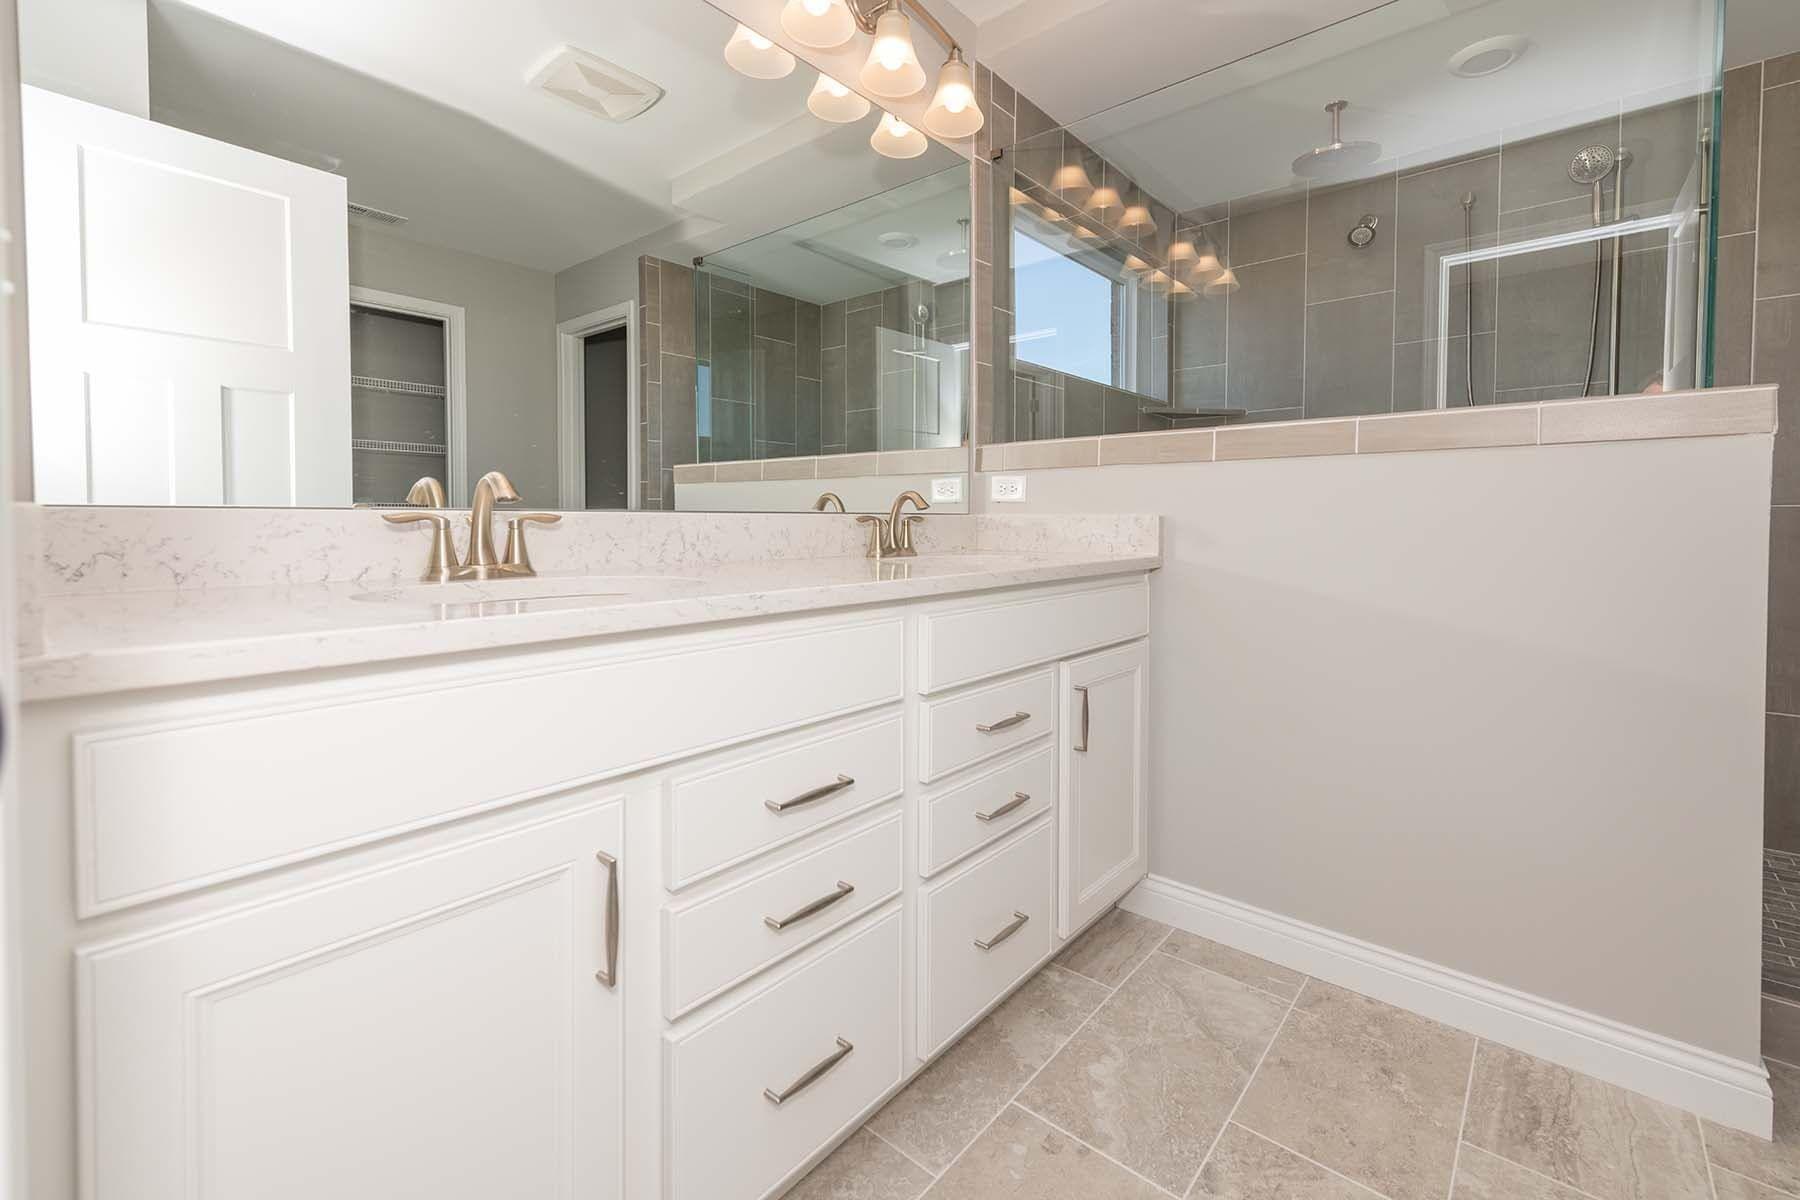 Bathroom featured in the Nicholas By M/I Homes in Cincinnati, OH